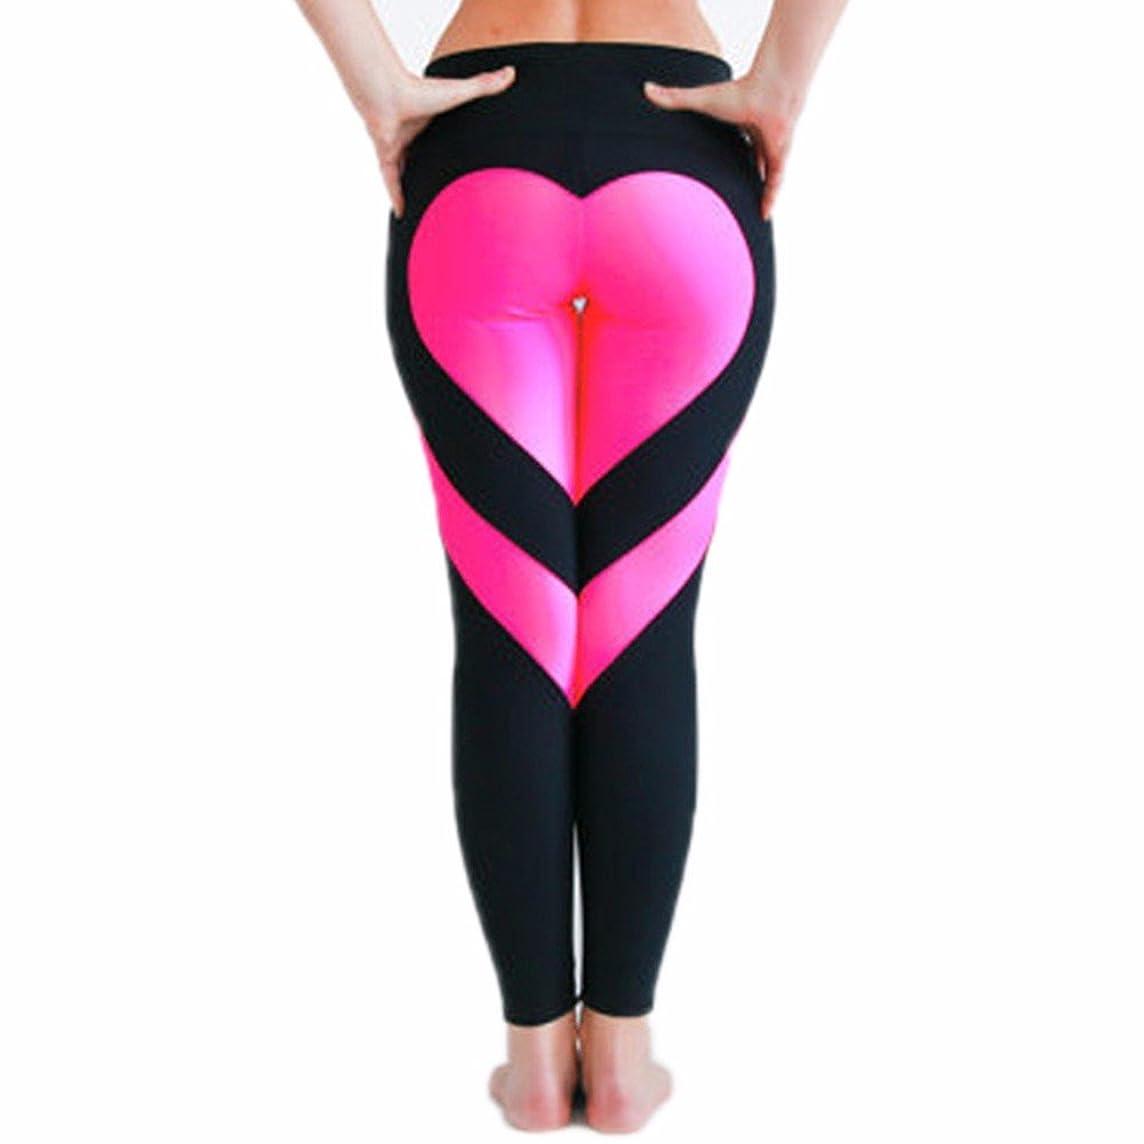 2018 Hot! Women's Fitness Leggings Workout Ankle-Length Yoga Pants Super Stretch Sportwear